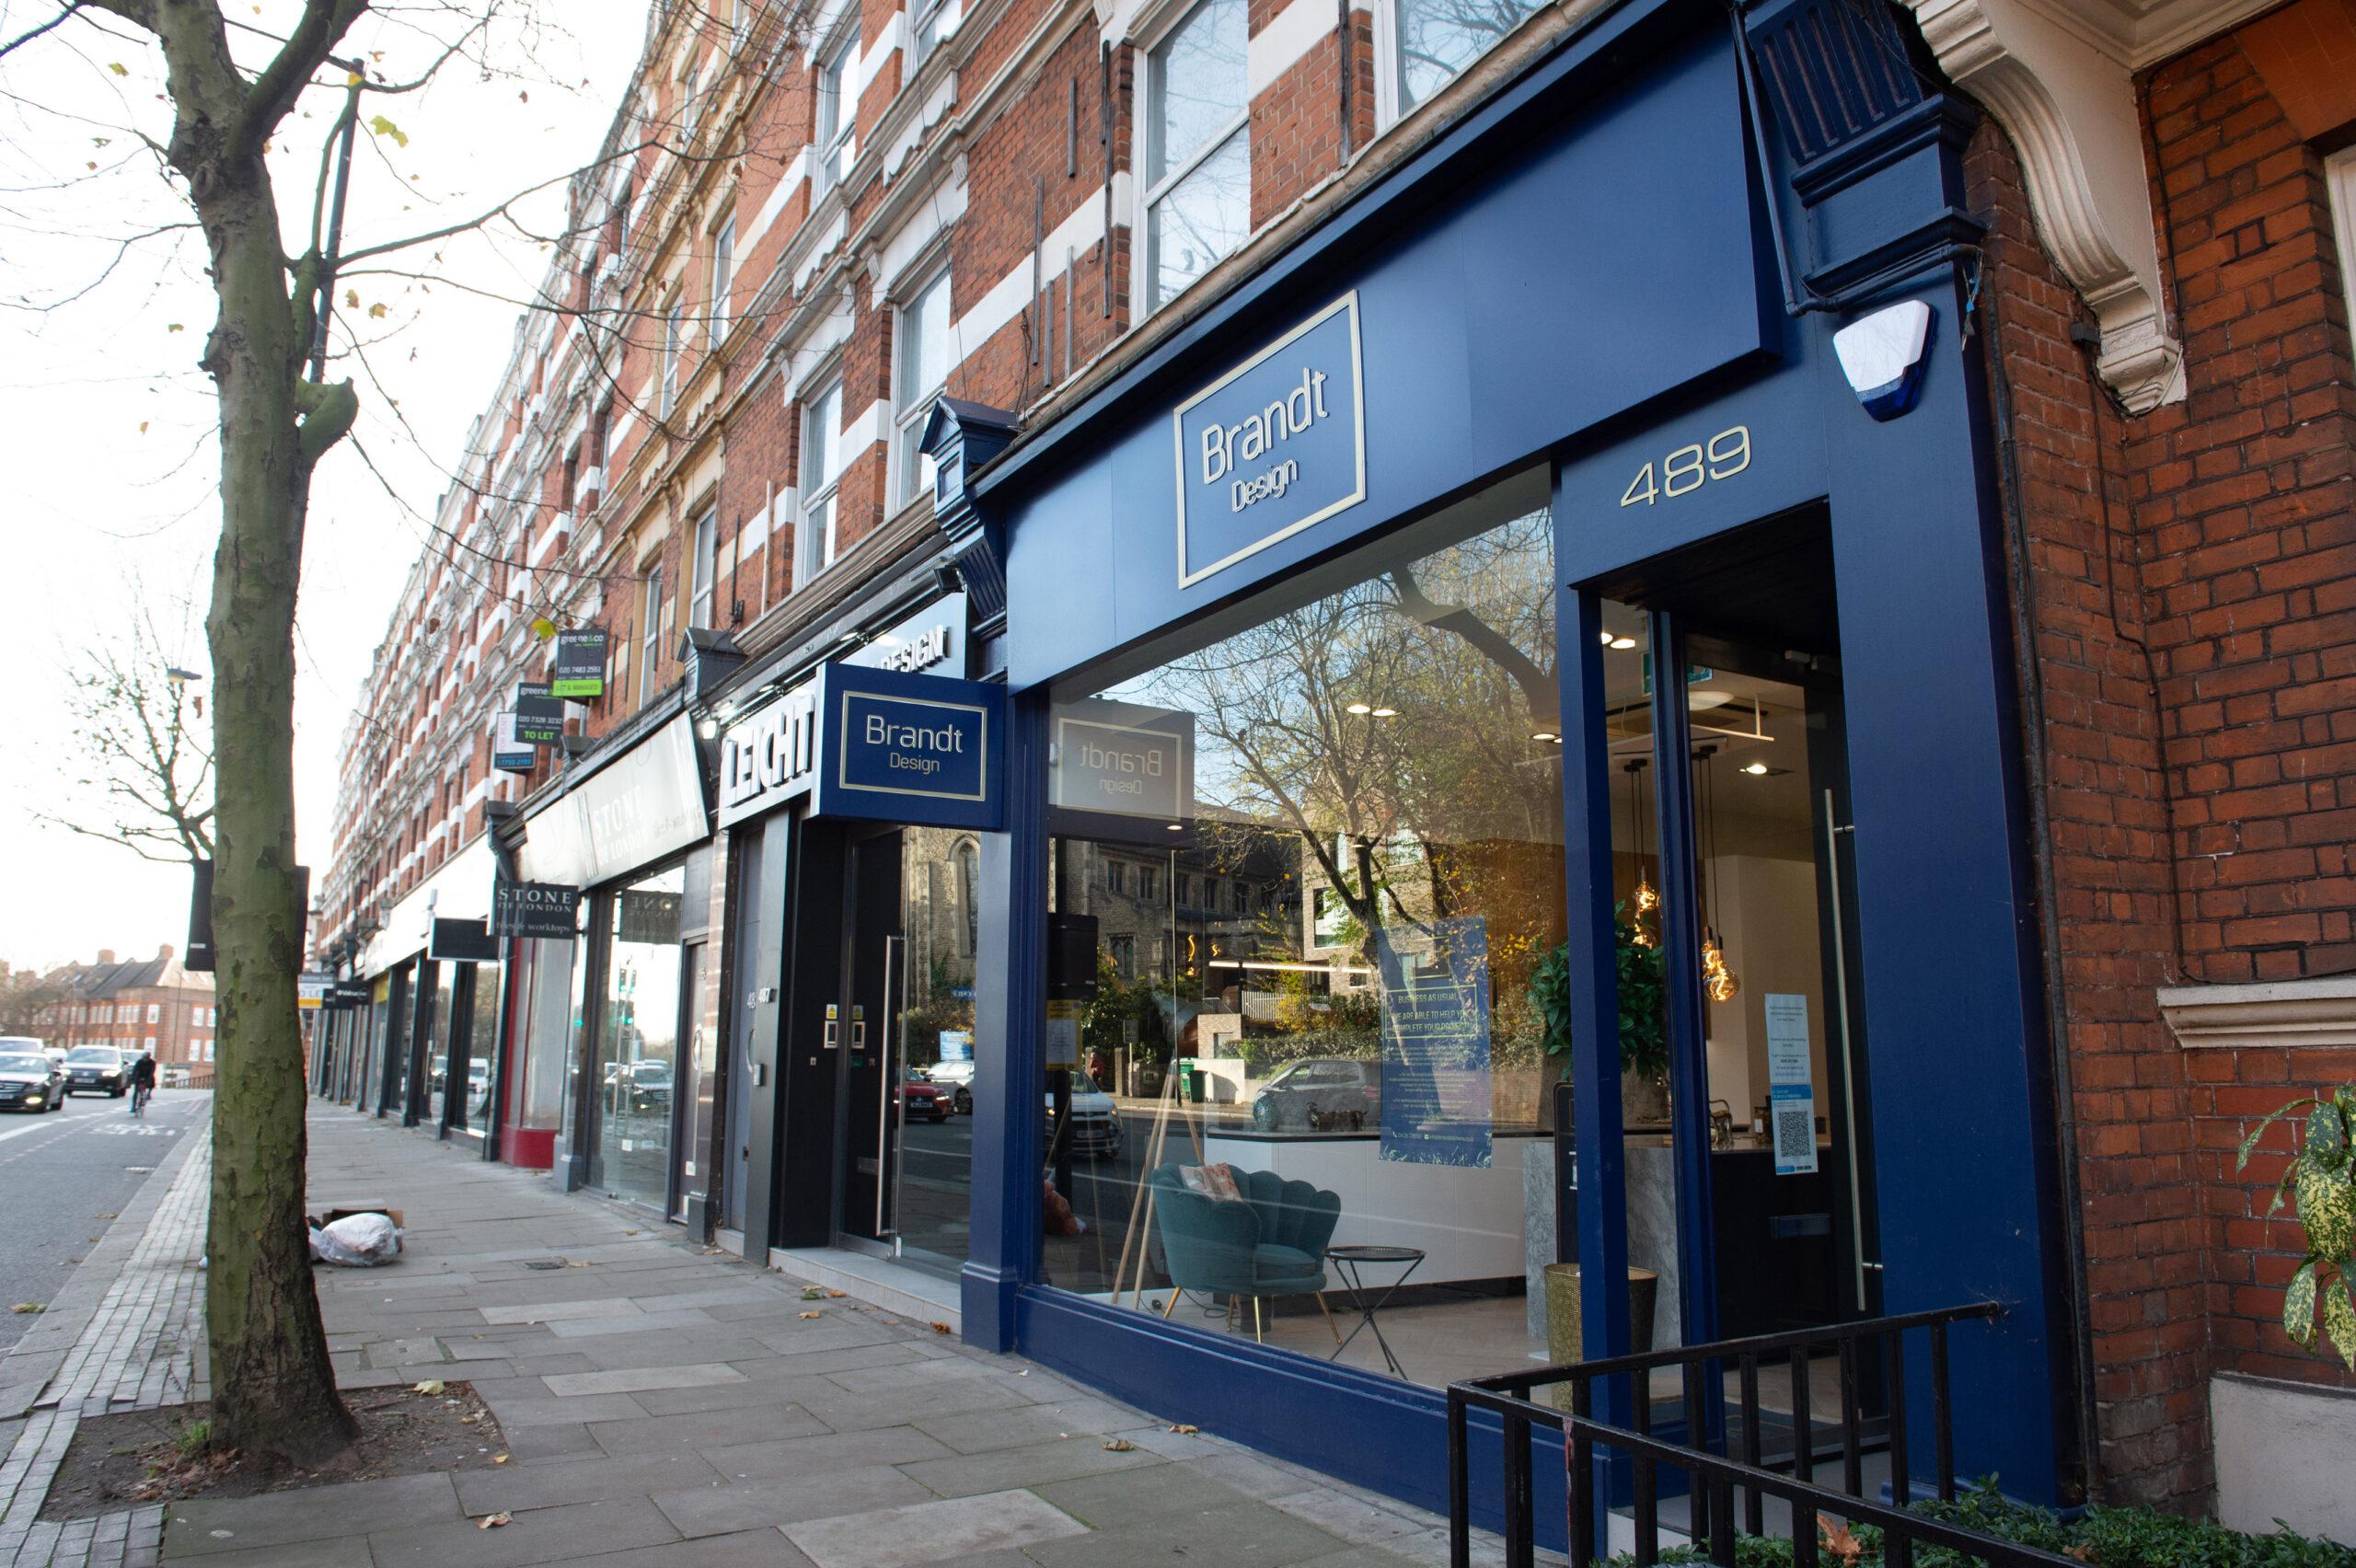 _Brandt Design Hampstead Showroom, 489 Finchley Rd_HR